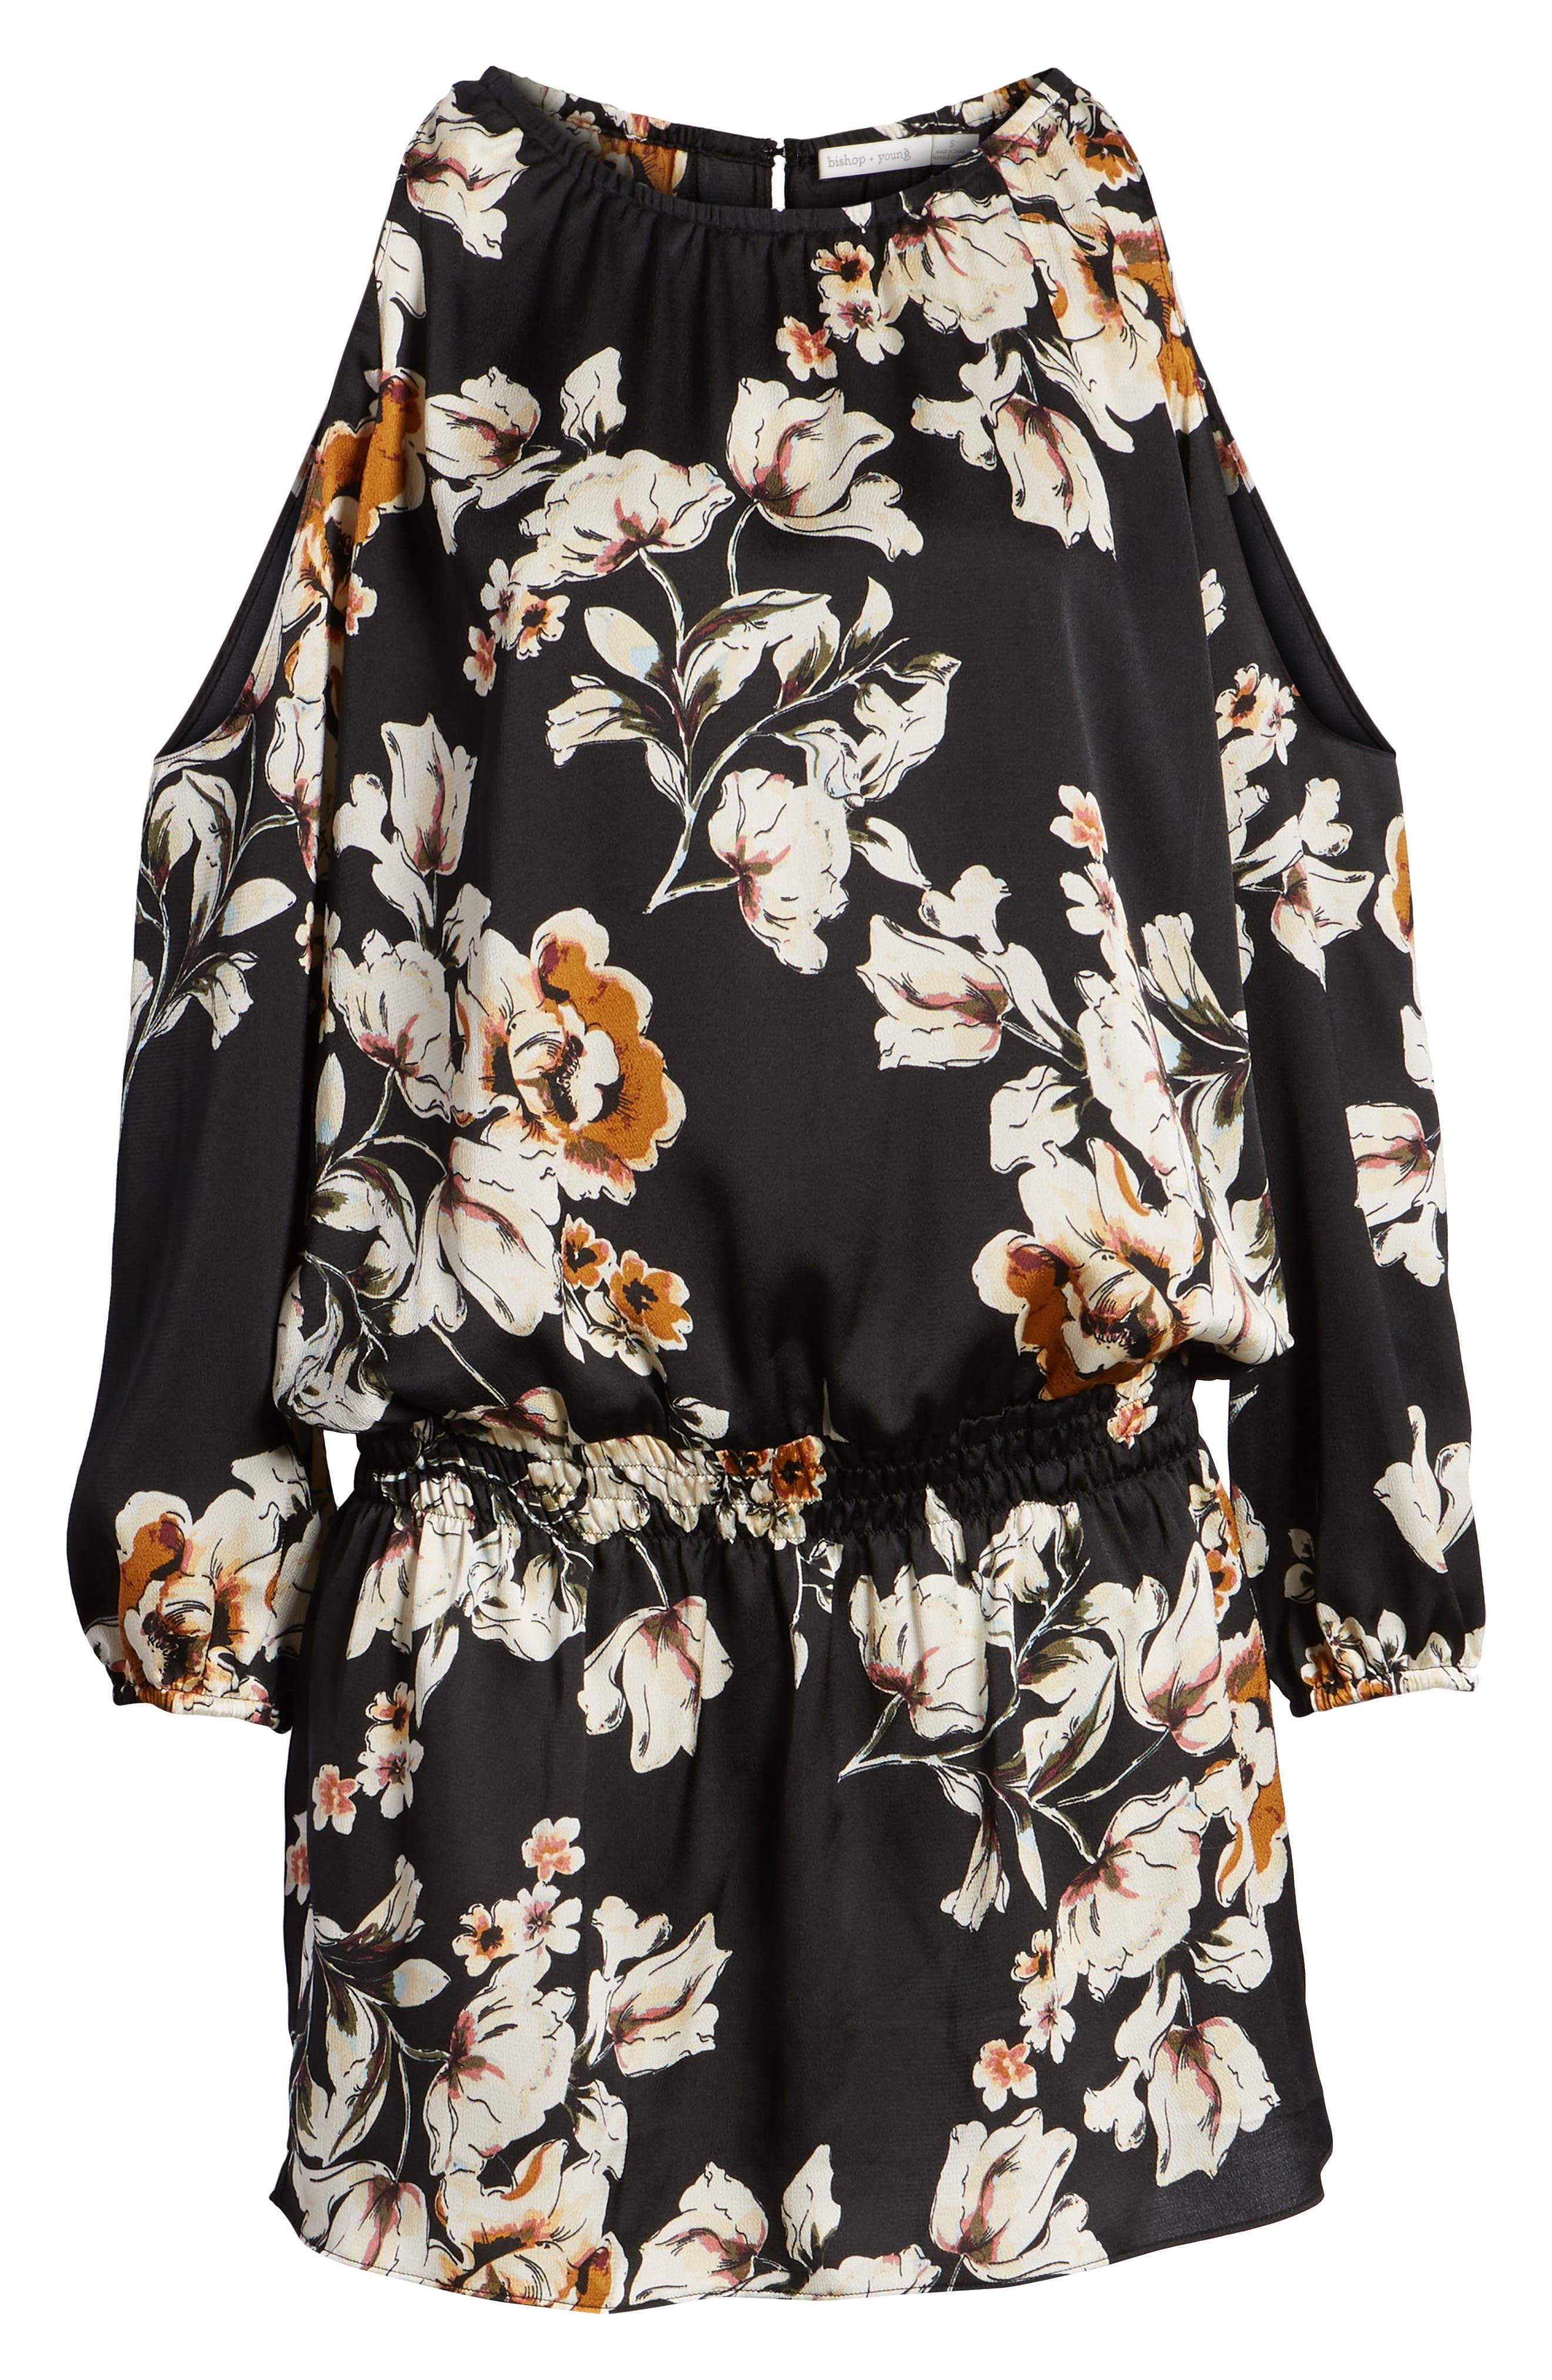 Bishop + Young Cold Shoulder Mini Dress,                             Alternate thumbnail 6, color,                             BLACK